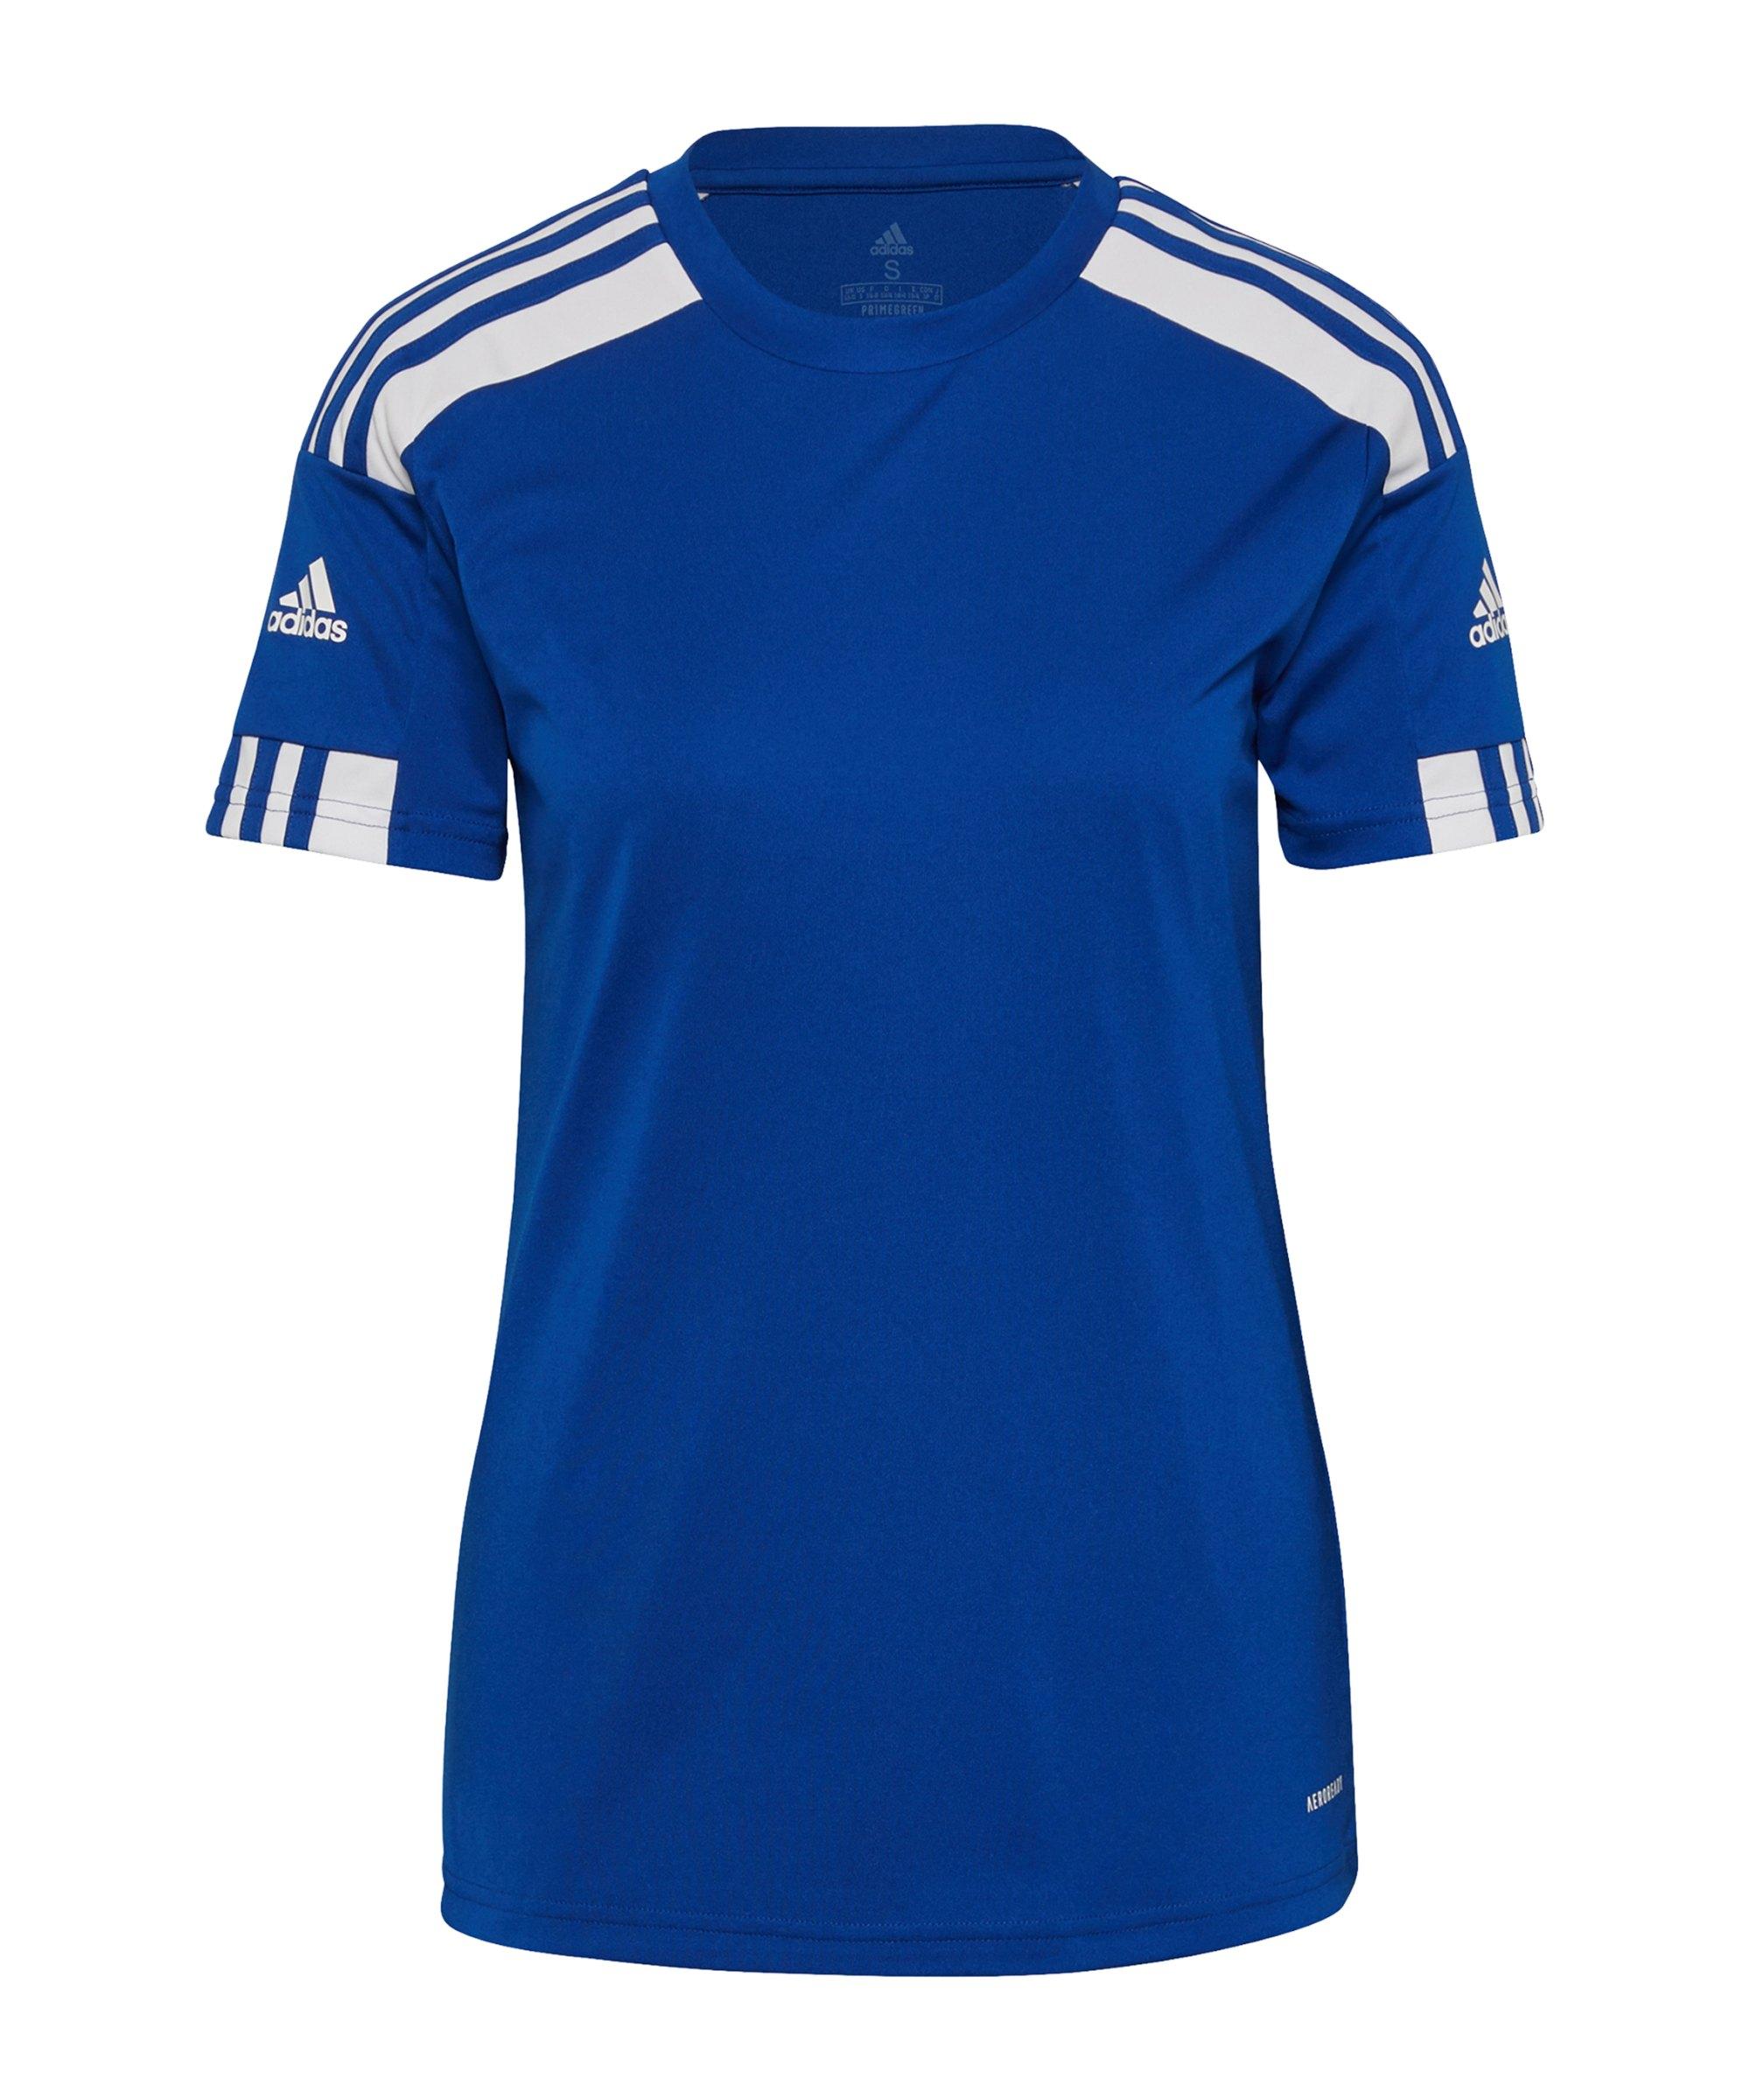 adidas Squadra 21 Trikot Damen Blau Weiss - blau